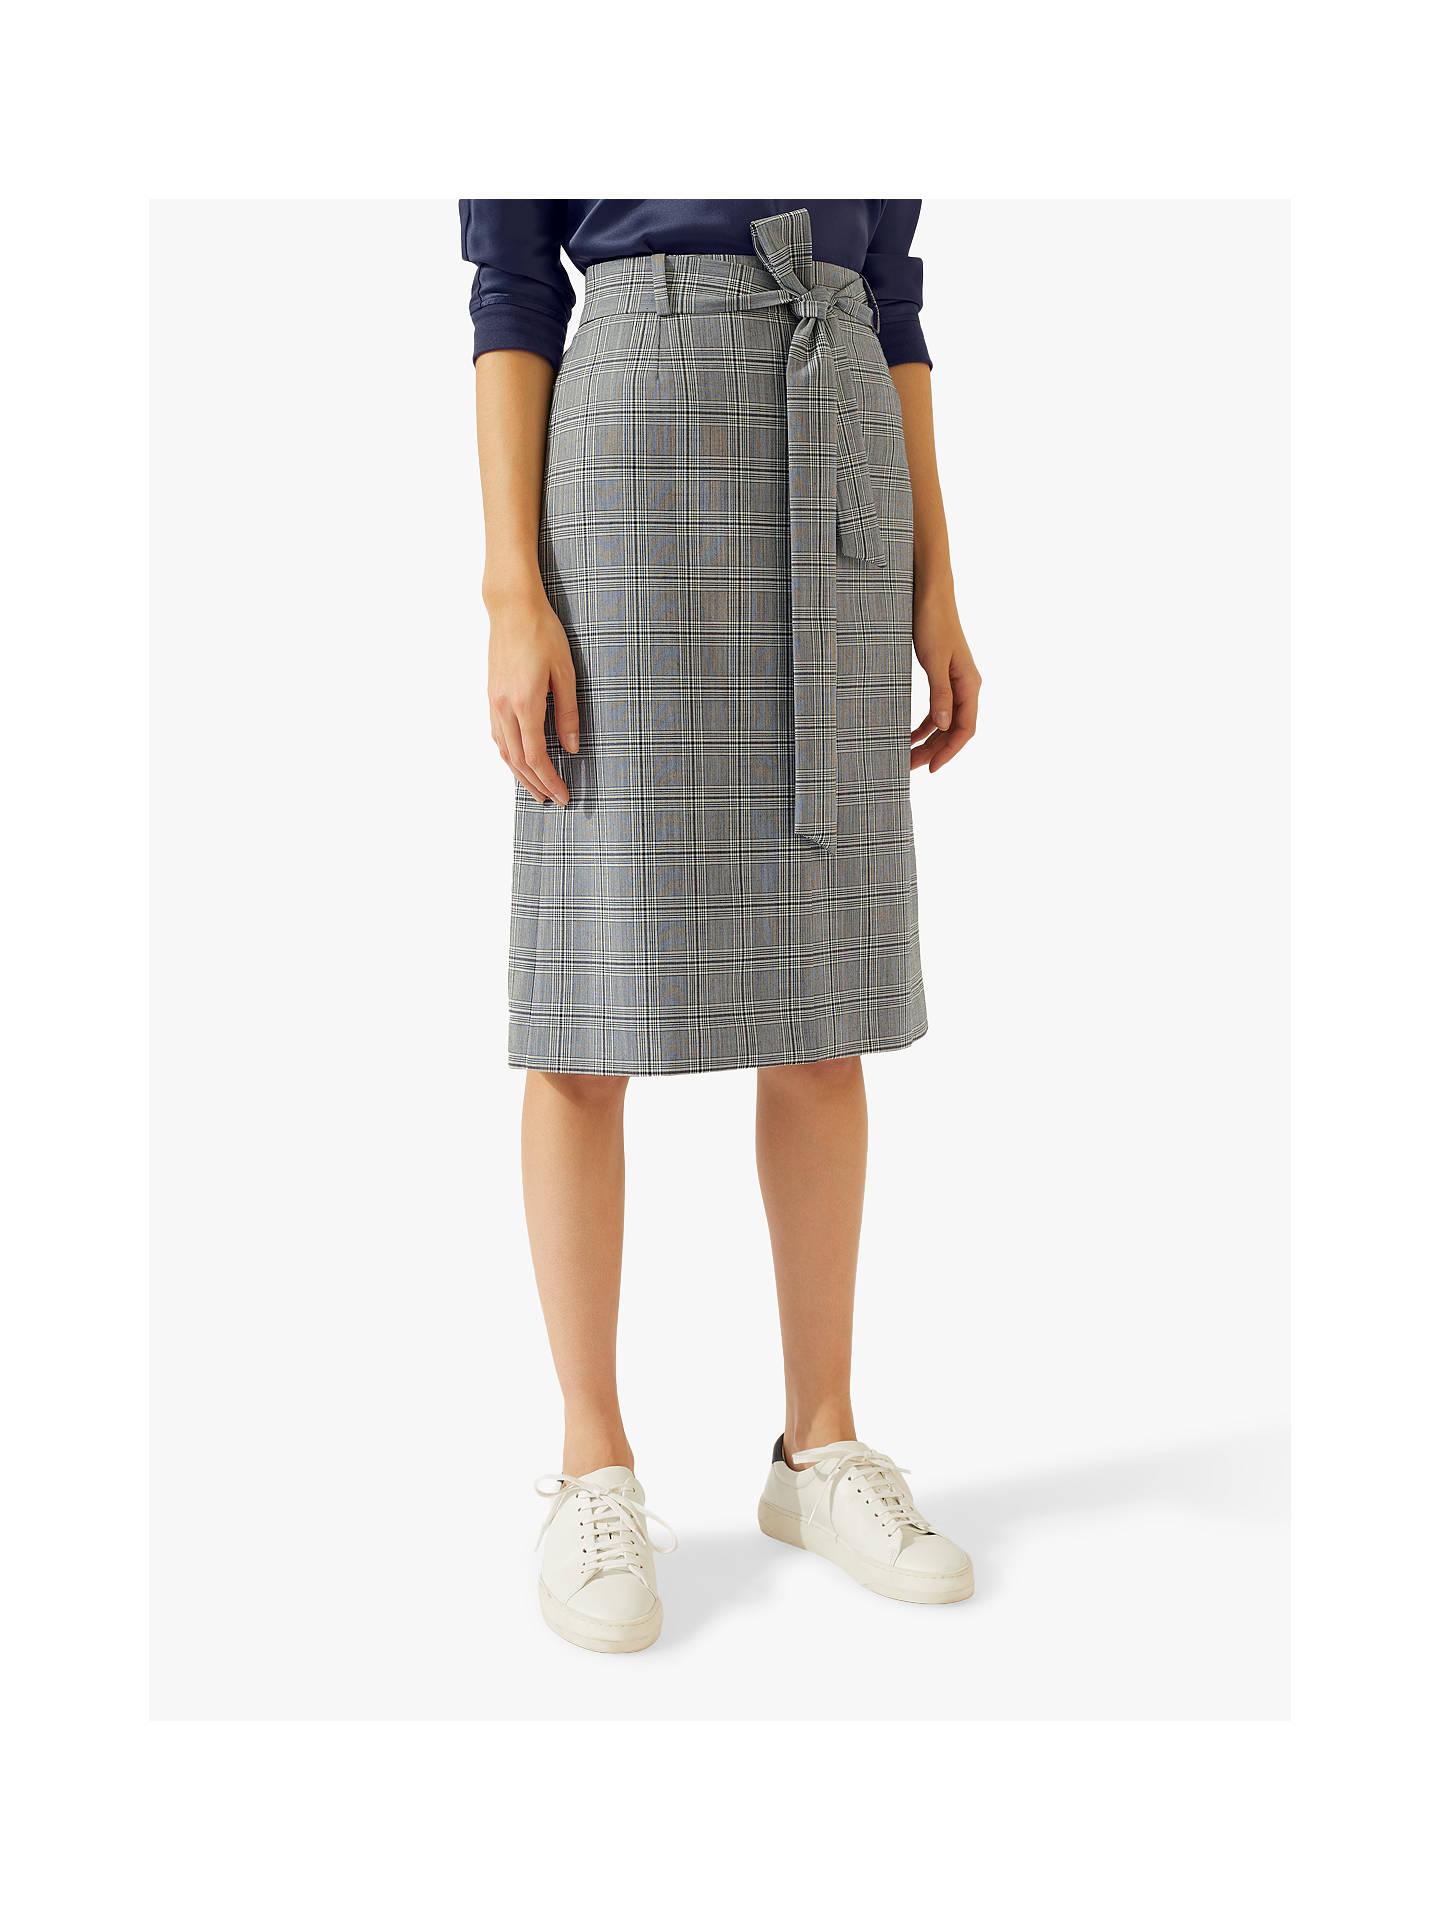 72b636077f81 Buy Jigsaw Monochrome Check Midi Skirt, Multi, 8 Online at johnlewis.com ...